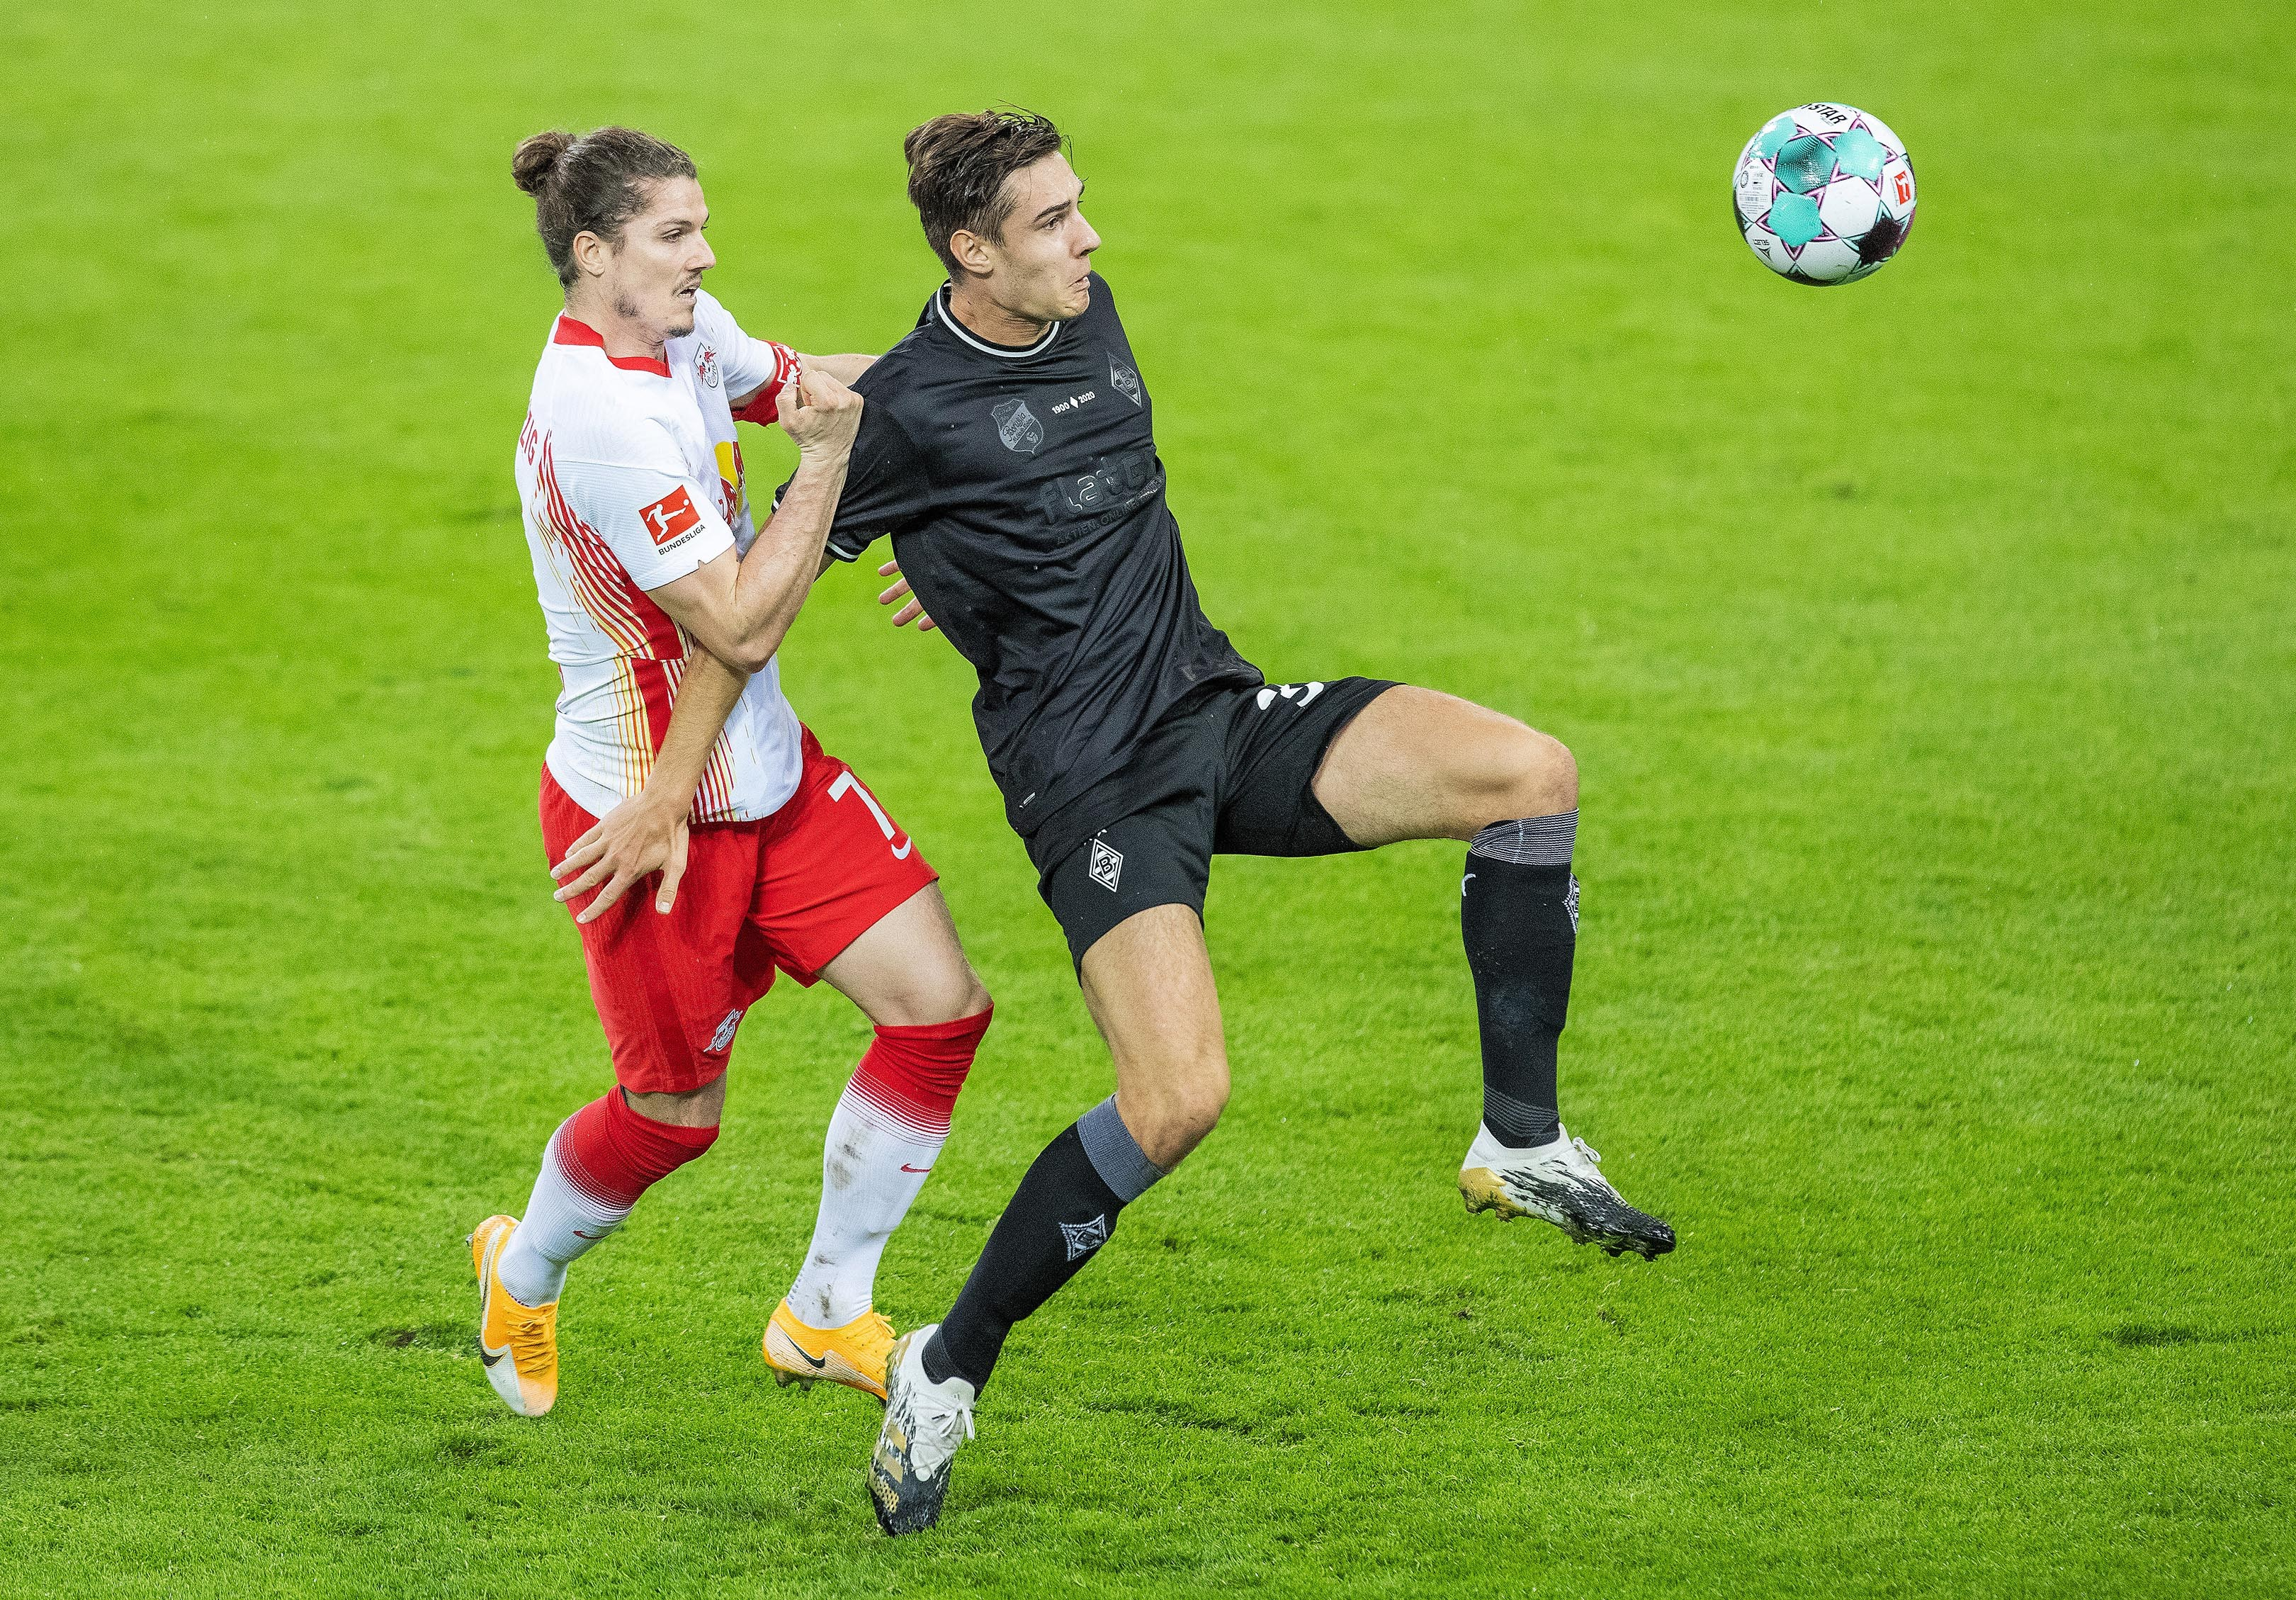 (SP)GERMANY-MOENCHENGLADBACH-FOOTBALL-BUNDESLIGA-LEIPZIG VS MOENCHENGLADBACH